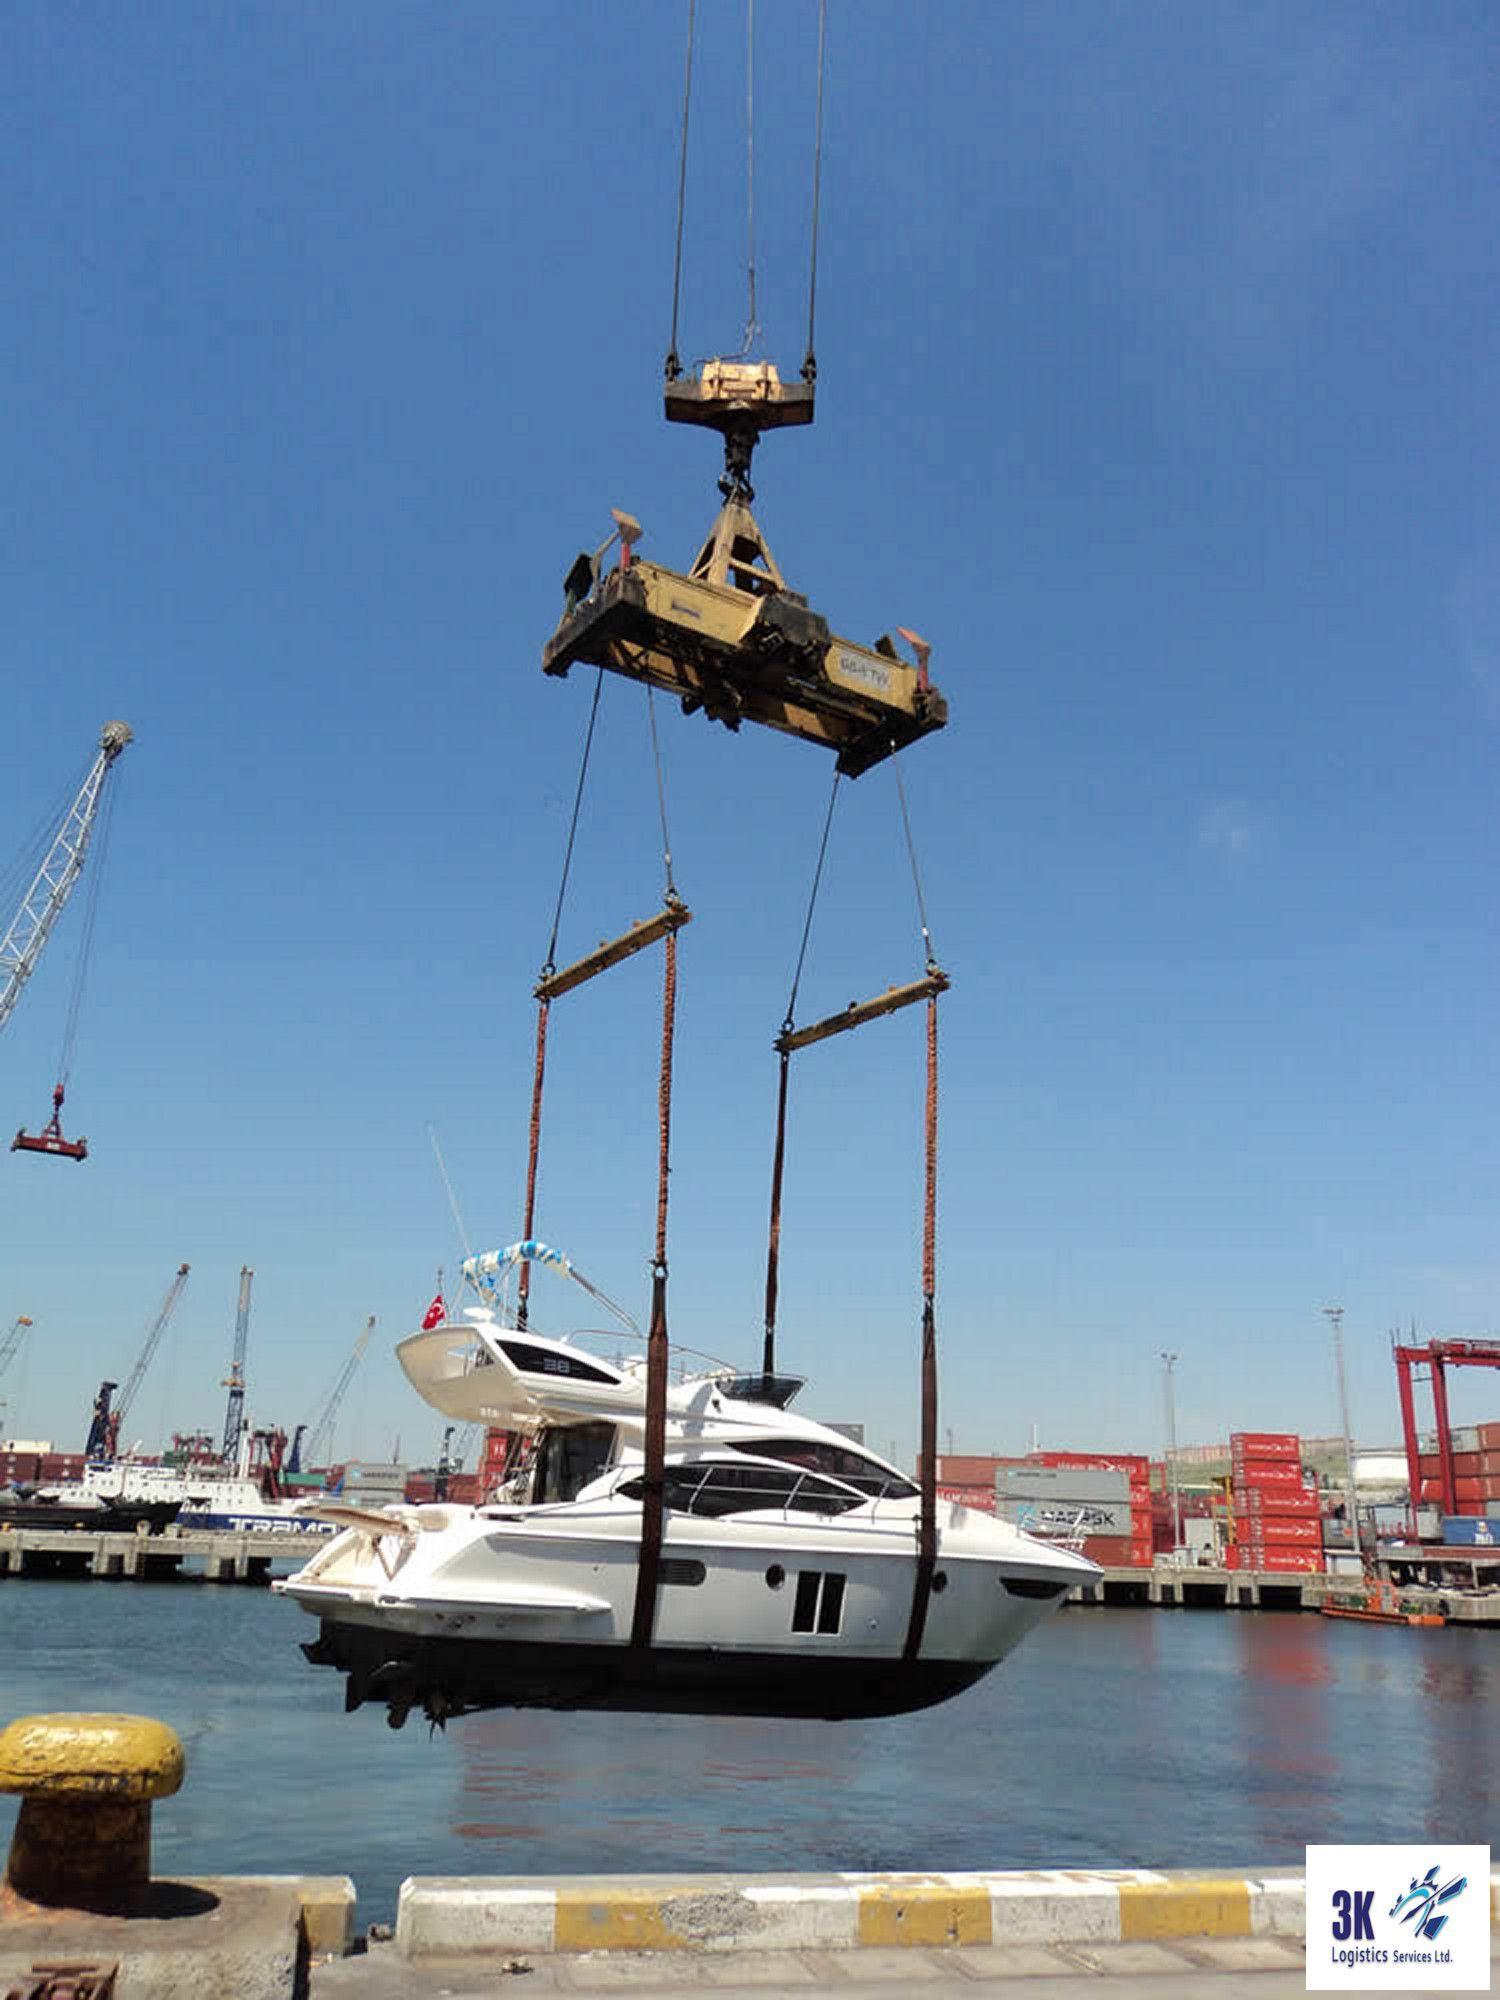 3K LOJISTIK LTD. Collection Logistics 2014